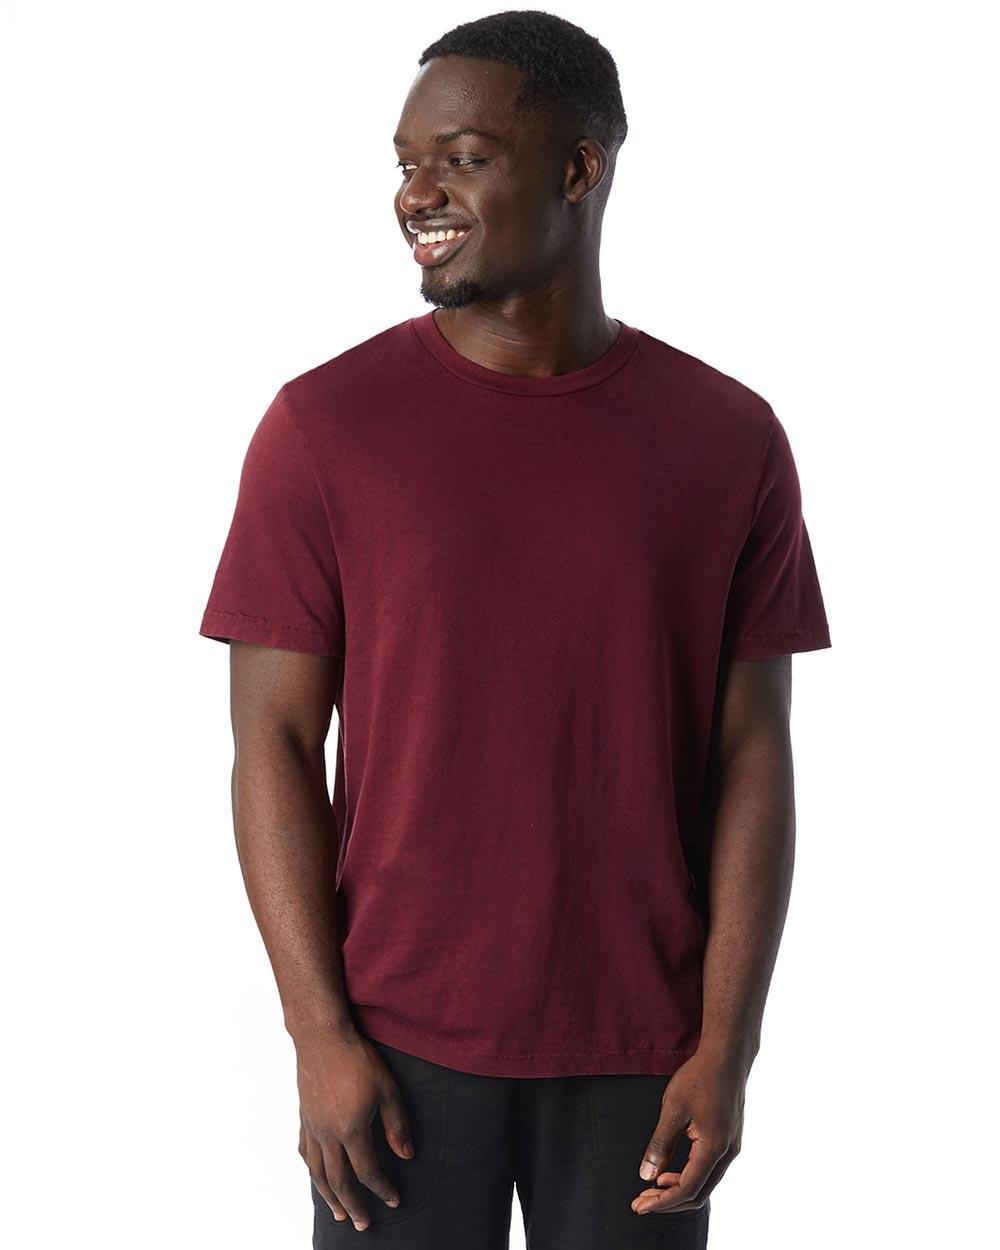 Alternative Apparel 1010CG - Unisex Outsider T-Shirt